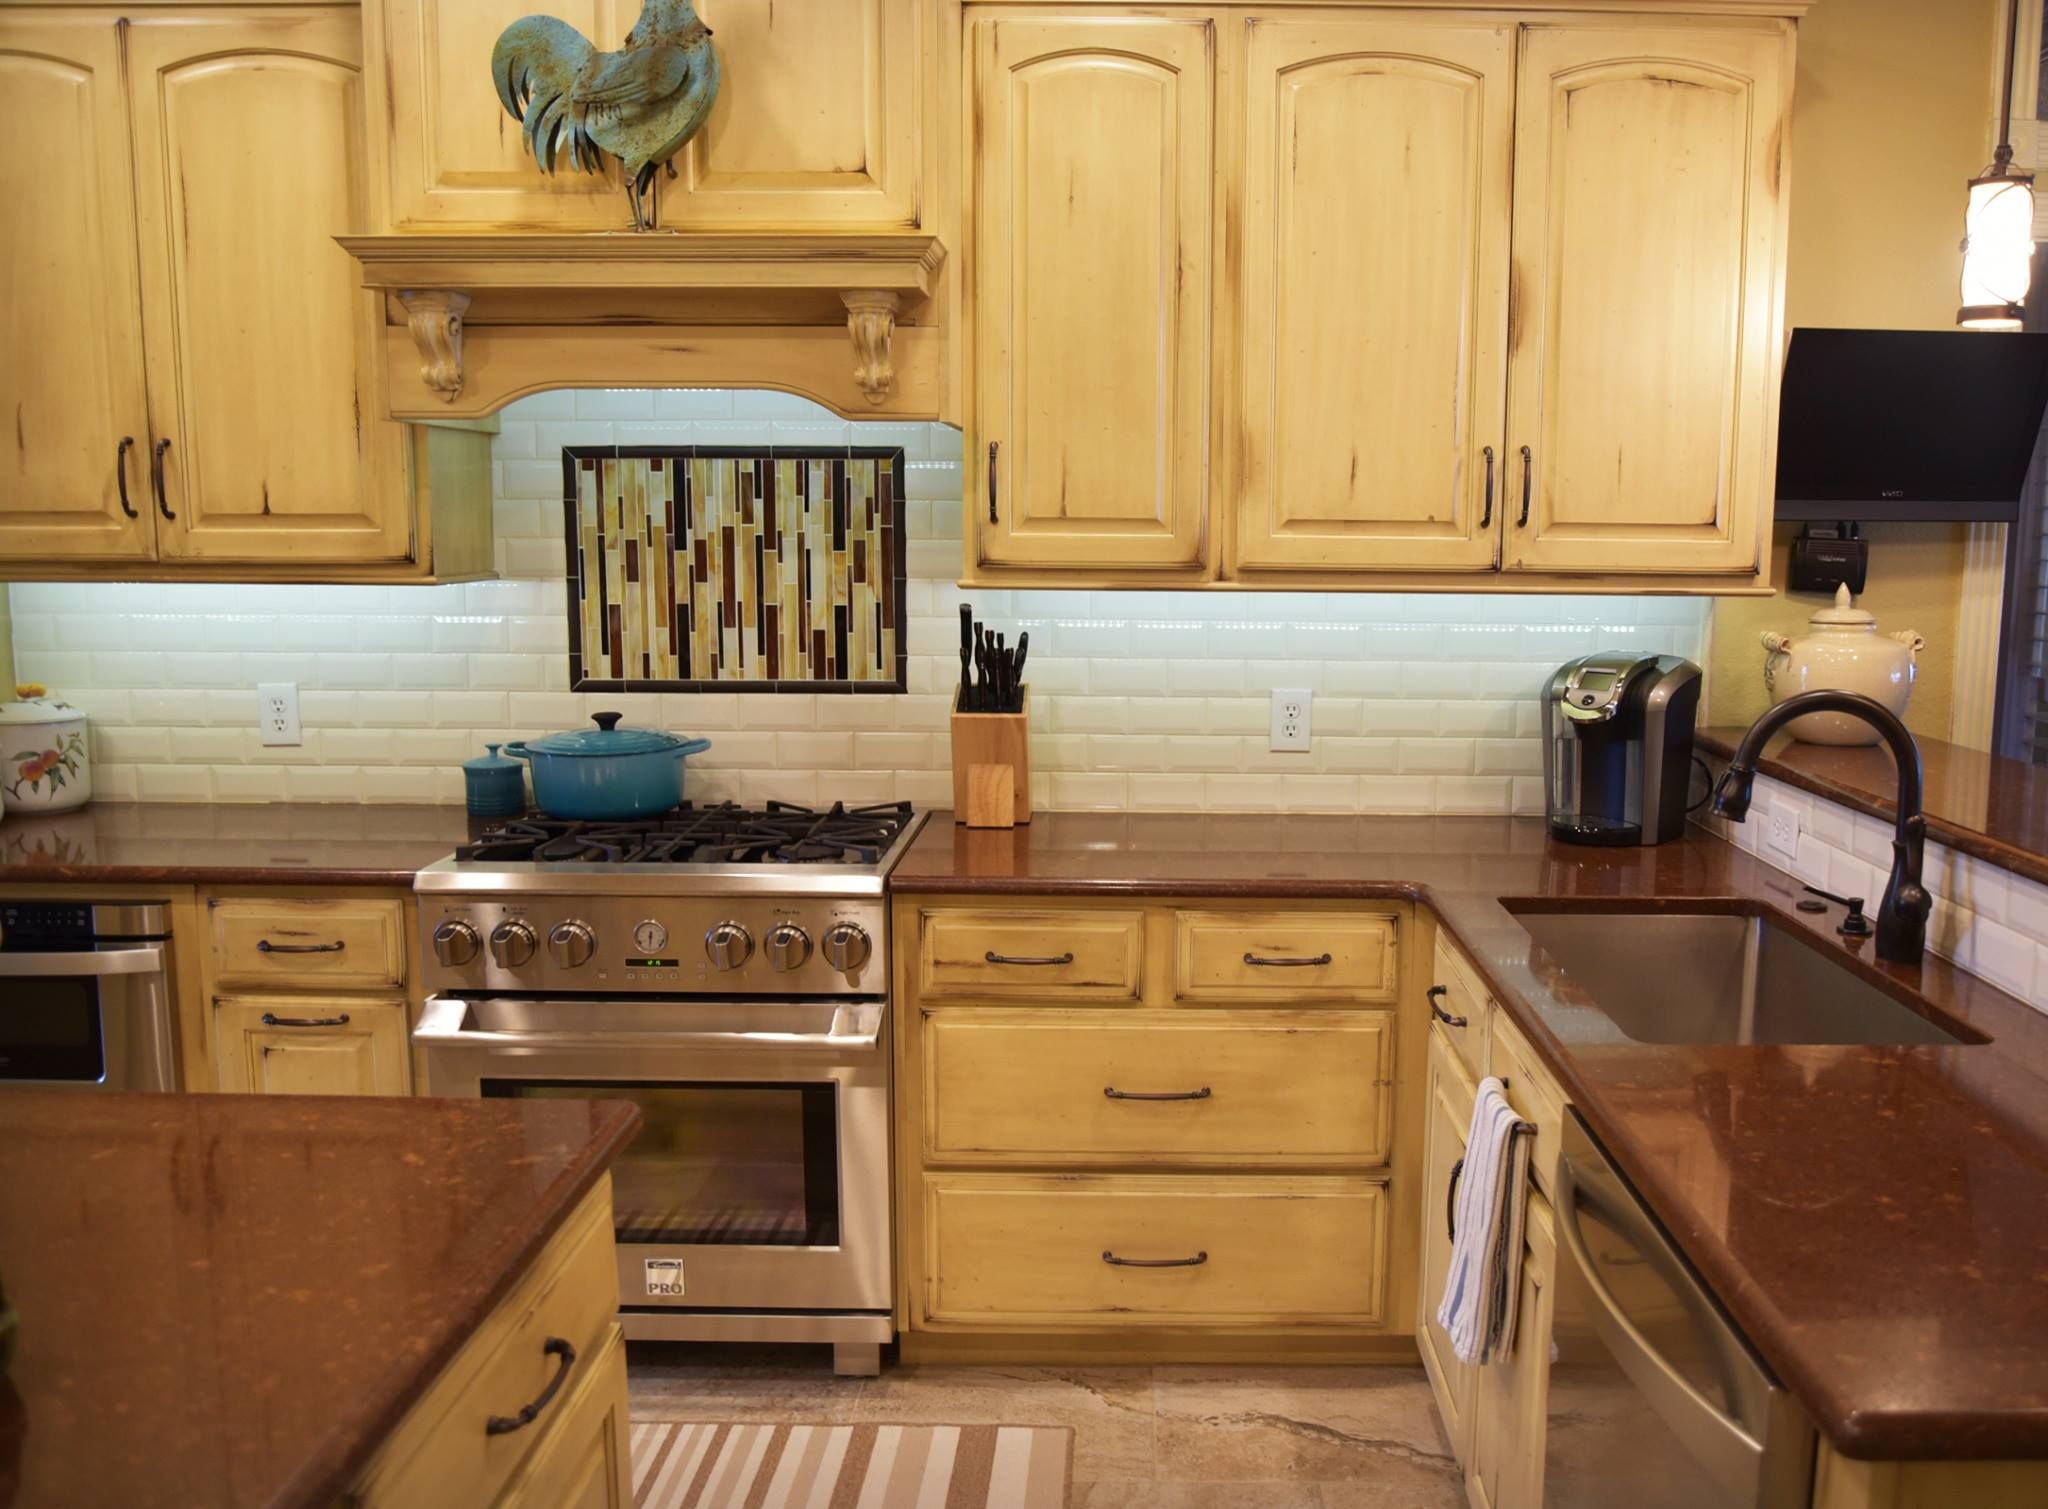 We provided the cabinets and countertops for this beautiful kitchen remodel! Shiloh Cabinetry: Olde World Finish - Cornsilk Countertops: Cambria Quartz - Burnbury™